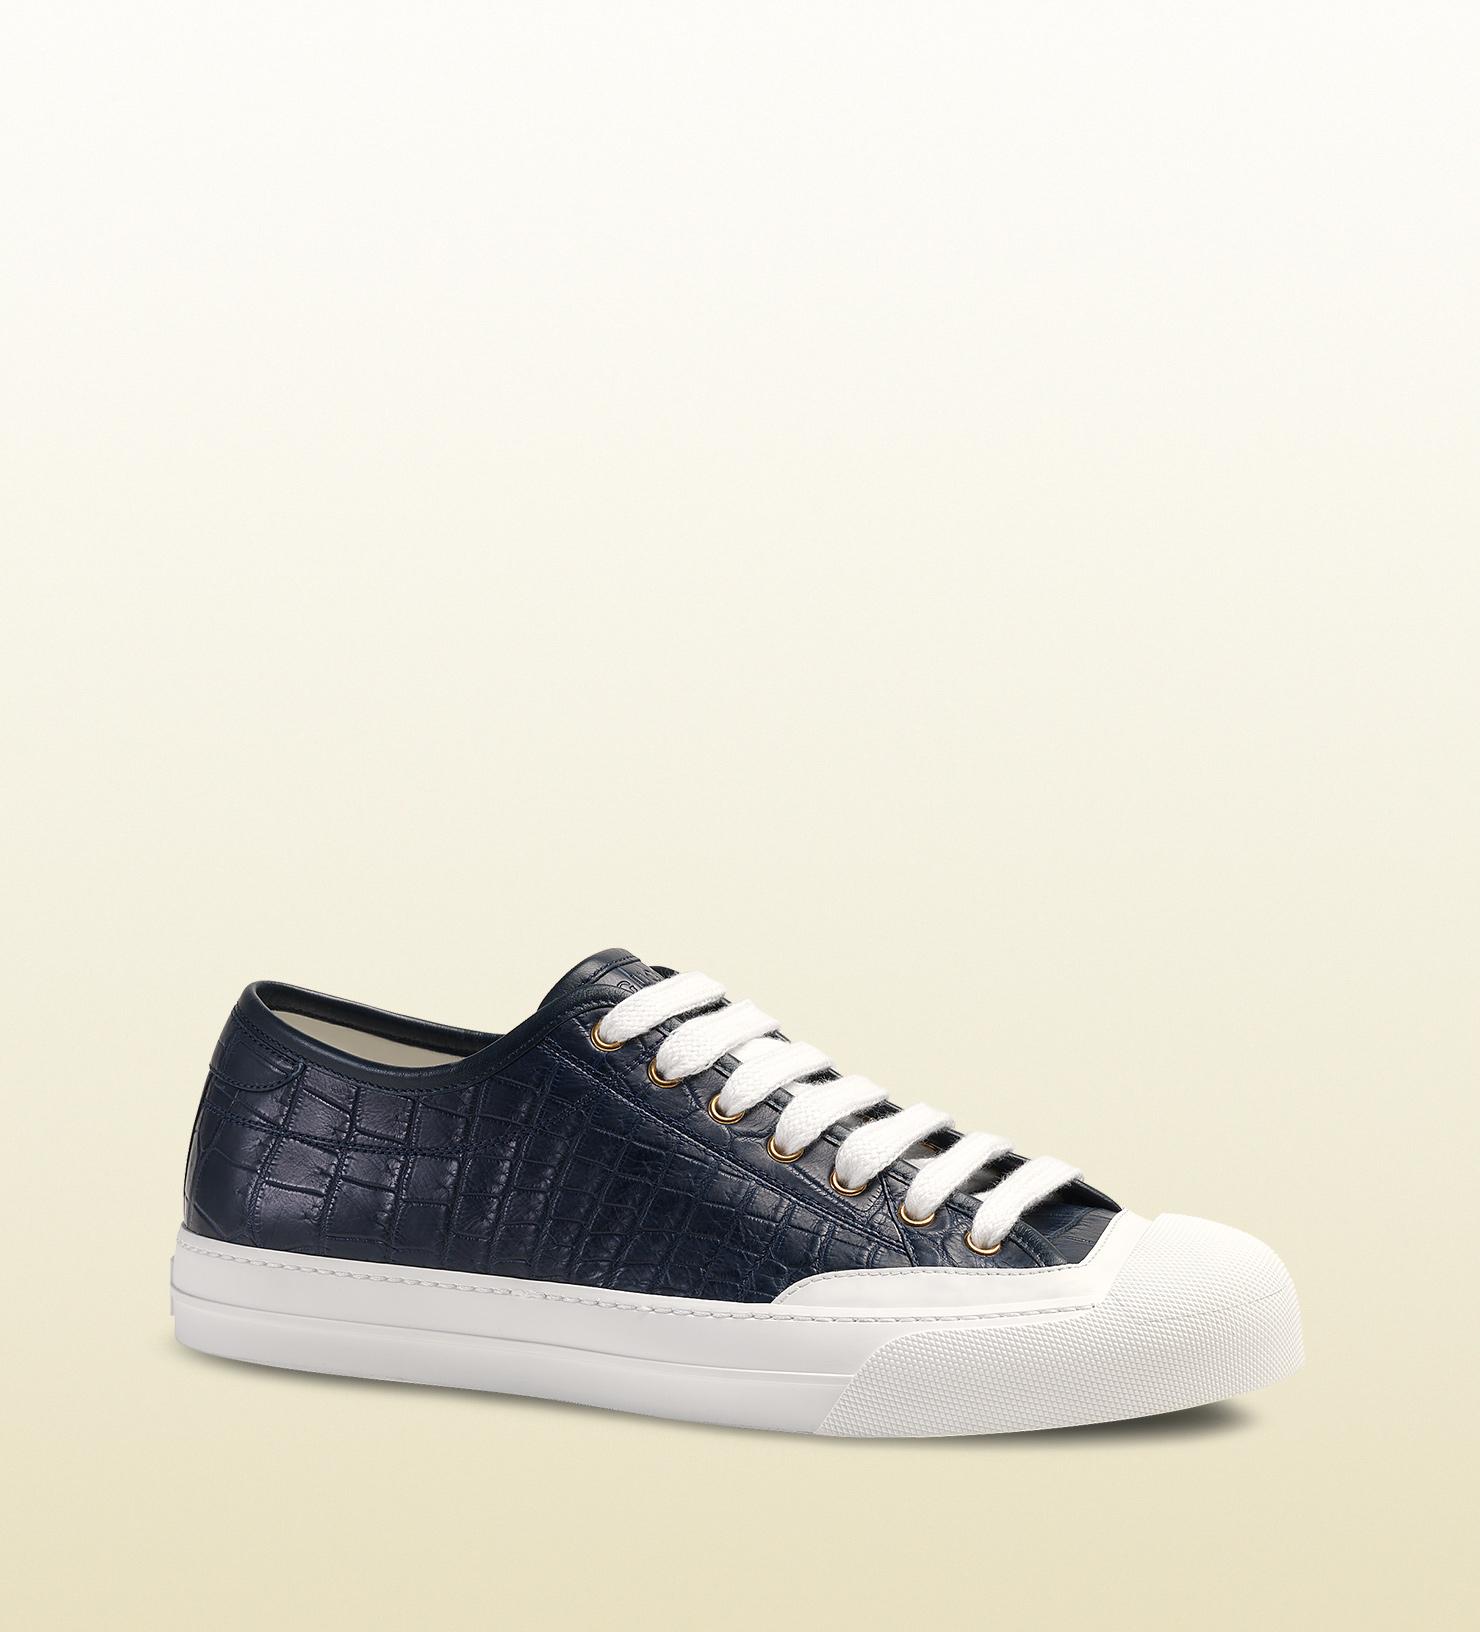 093adc4d7e0 Lyst - Gucci Crocodile Low-top Sneaker in Black for Men